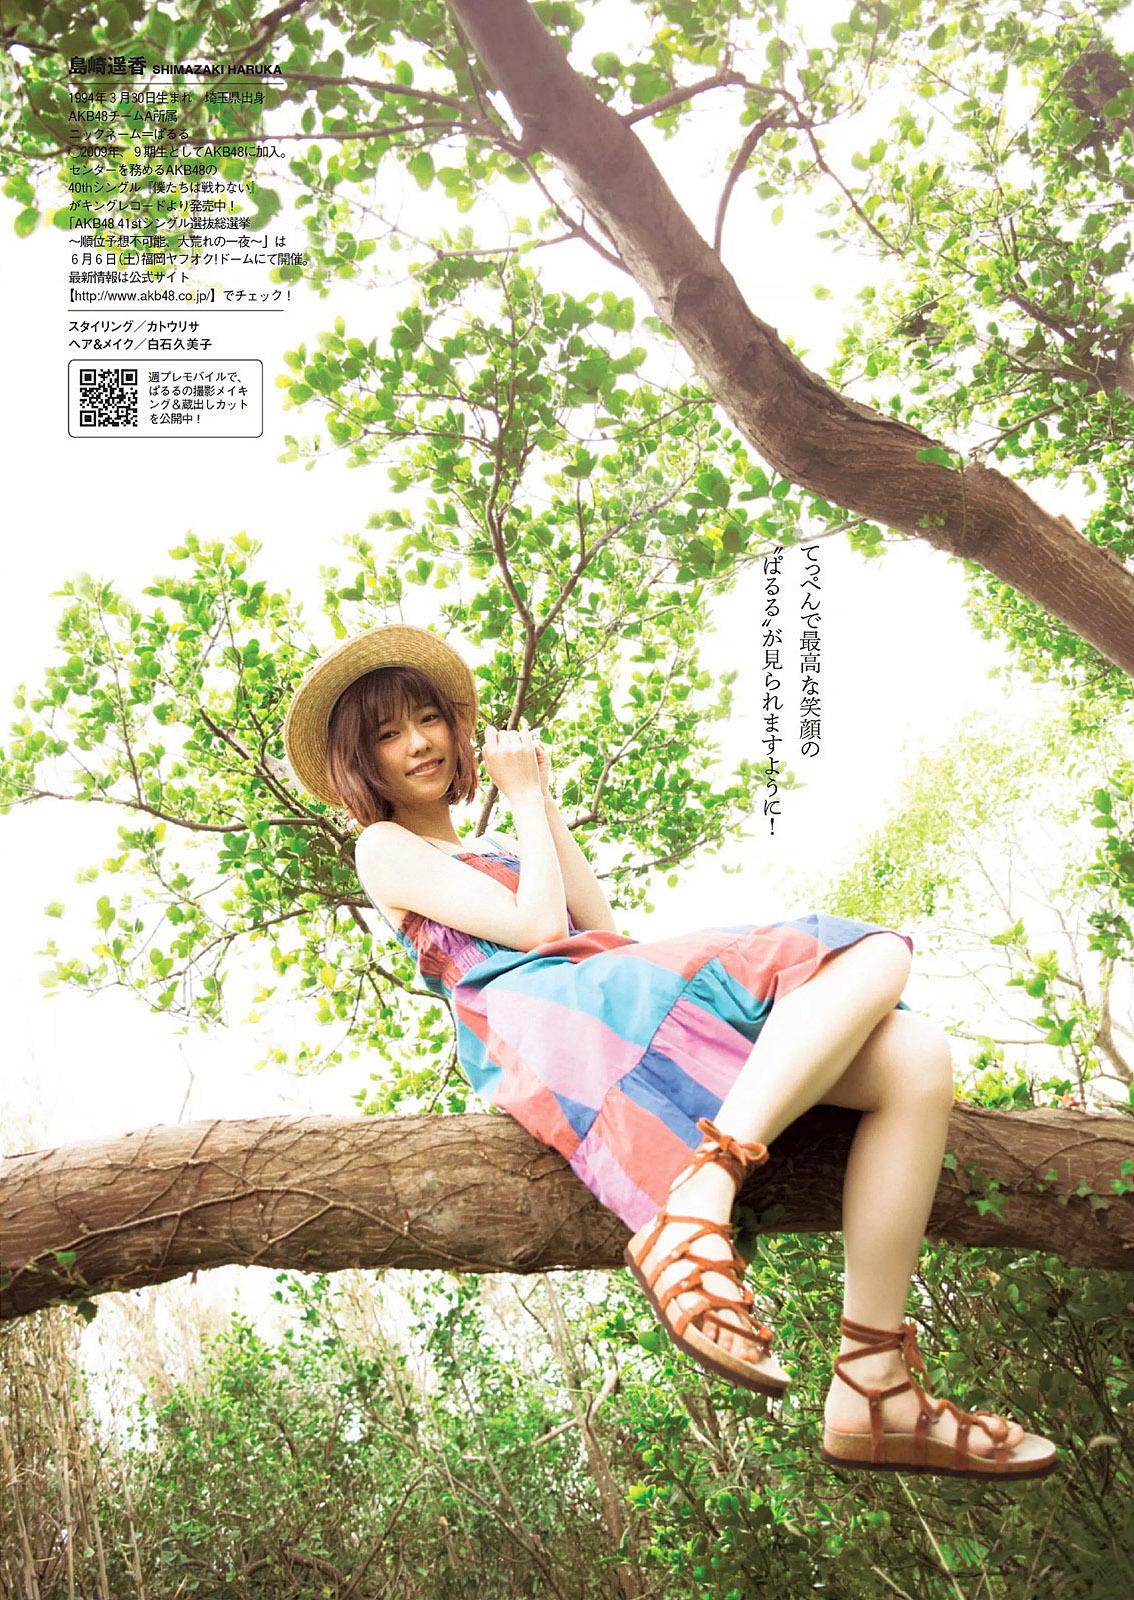 HShimazaki WPB 150615 06.jpg